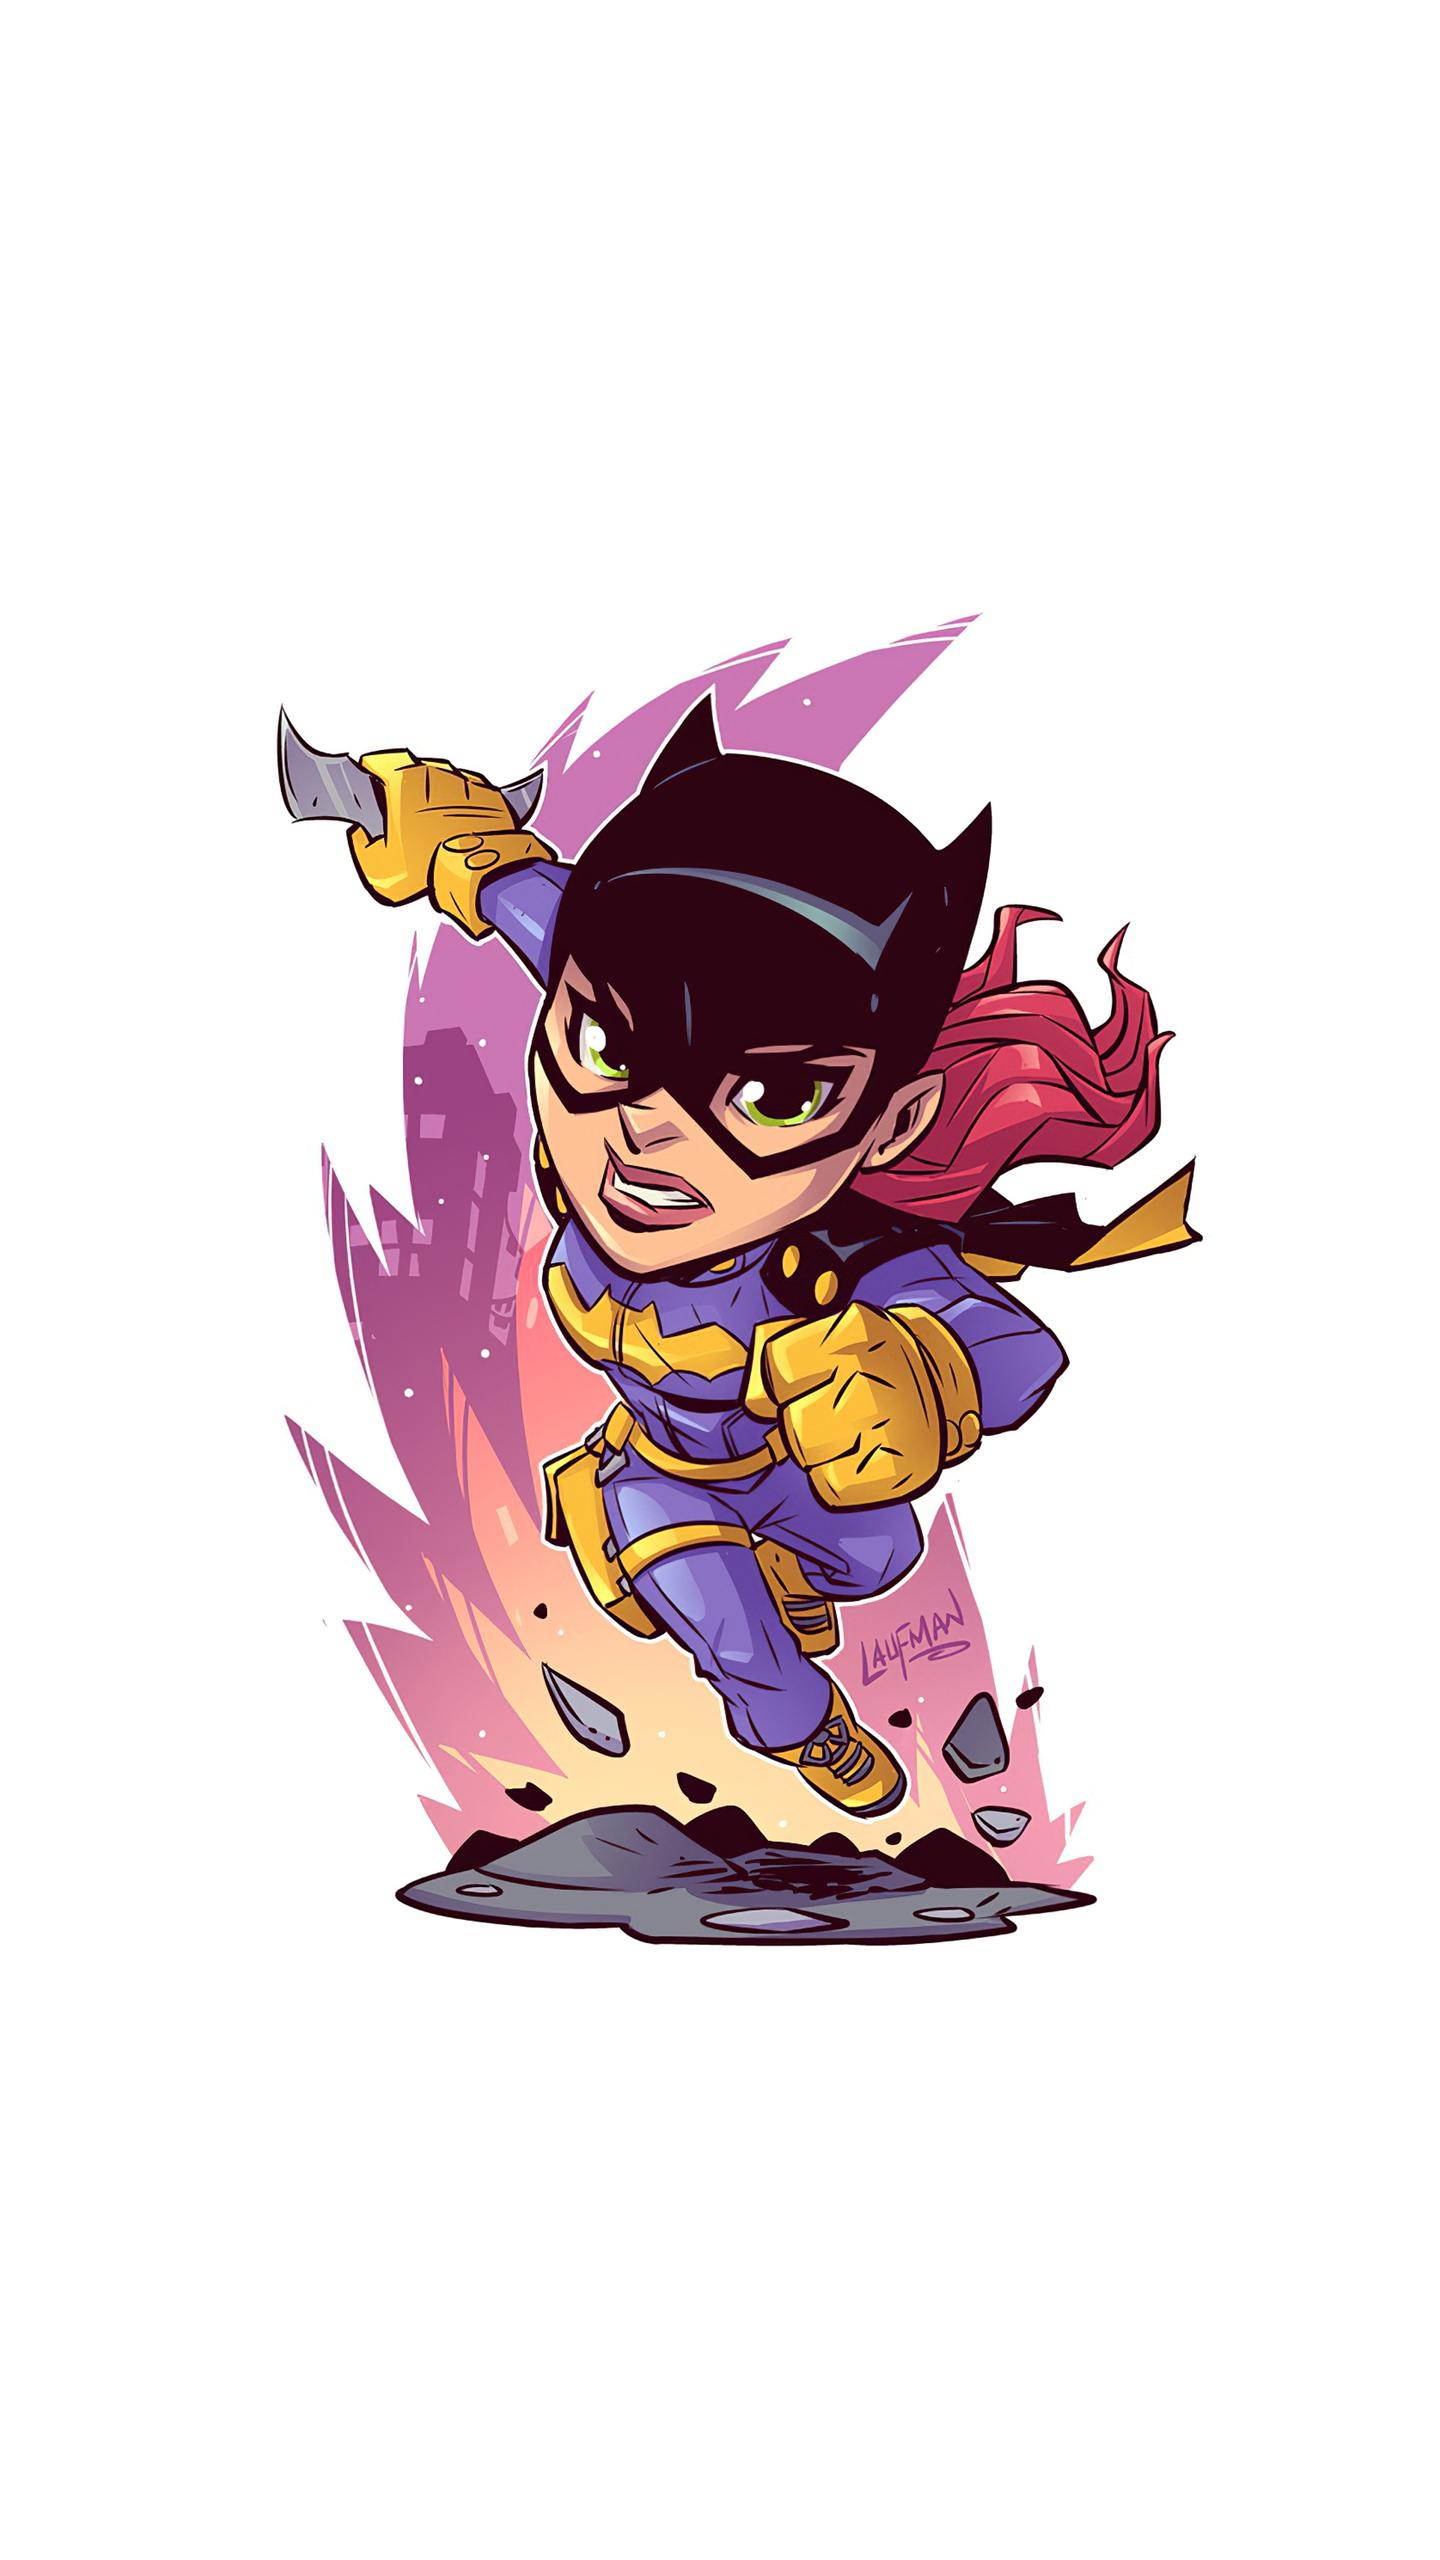 batgirl-minimal-art-4k-32.jpg